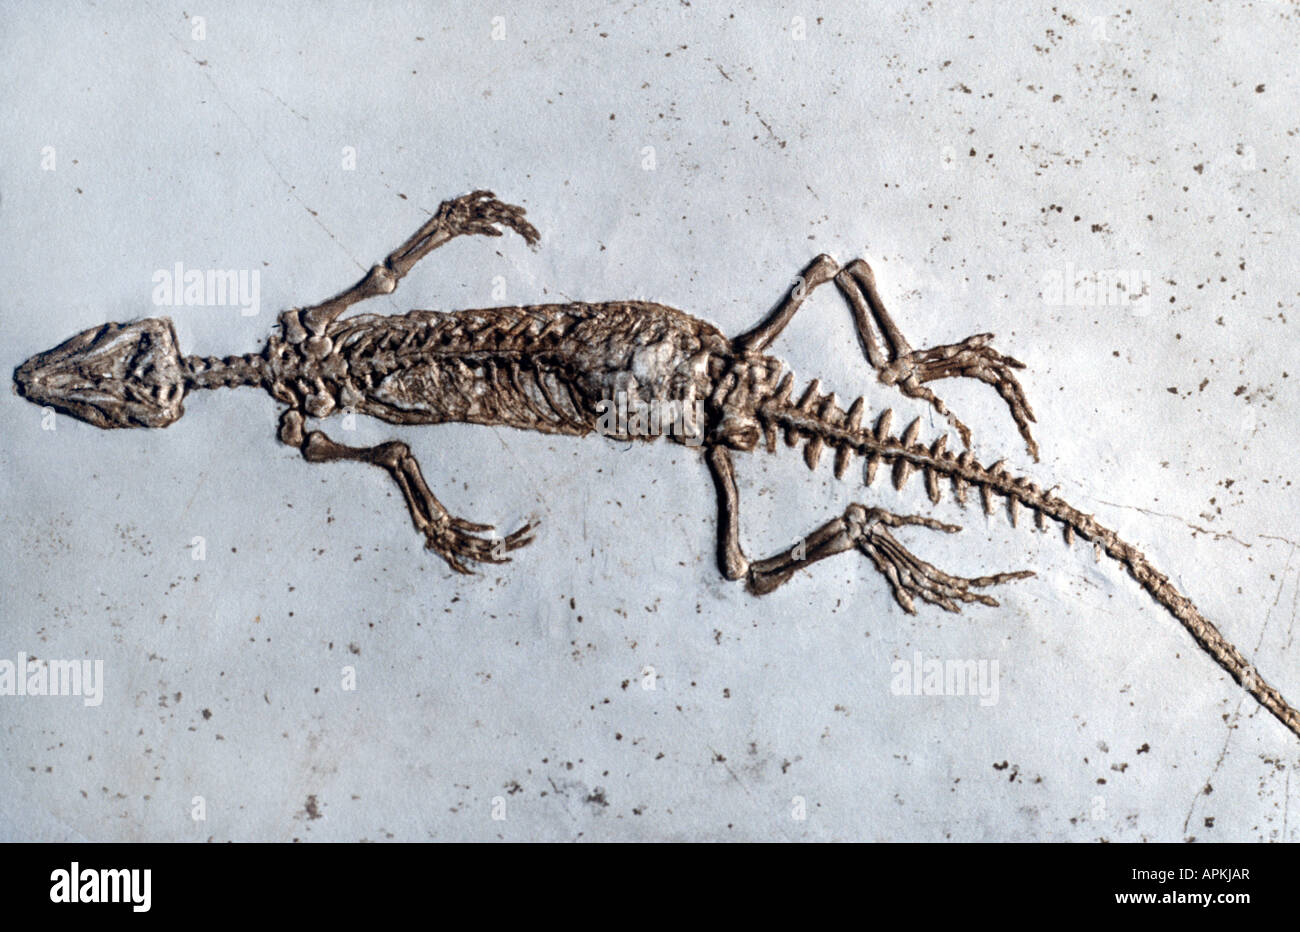 rhynchocephalians, Homoeosaurus pulchellus (Rhynchocephalia (Sphenodon), Homoeosaurus pulchellus), dinosaur of upper - Stock Image